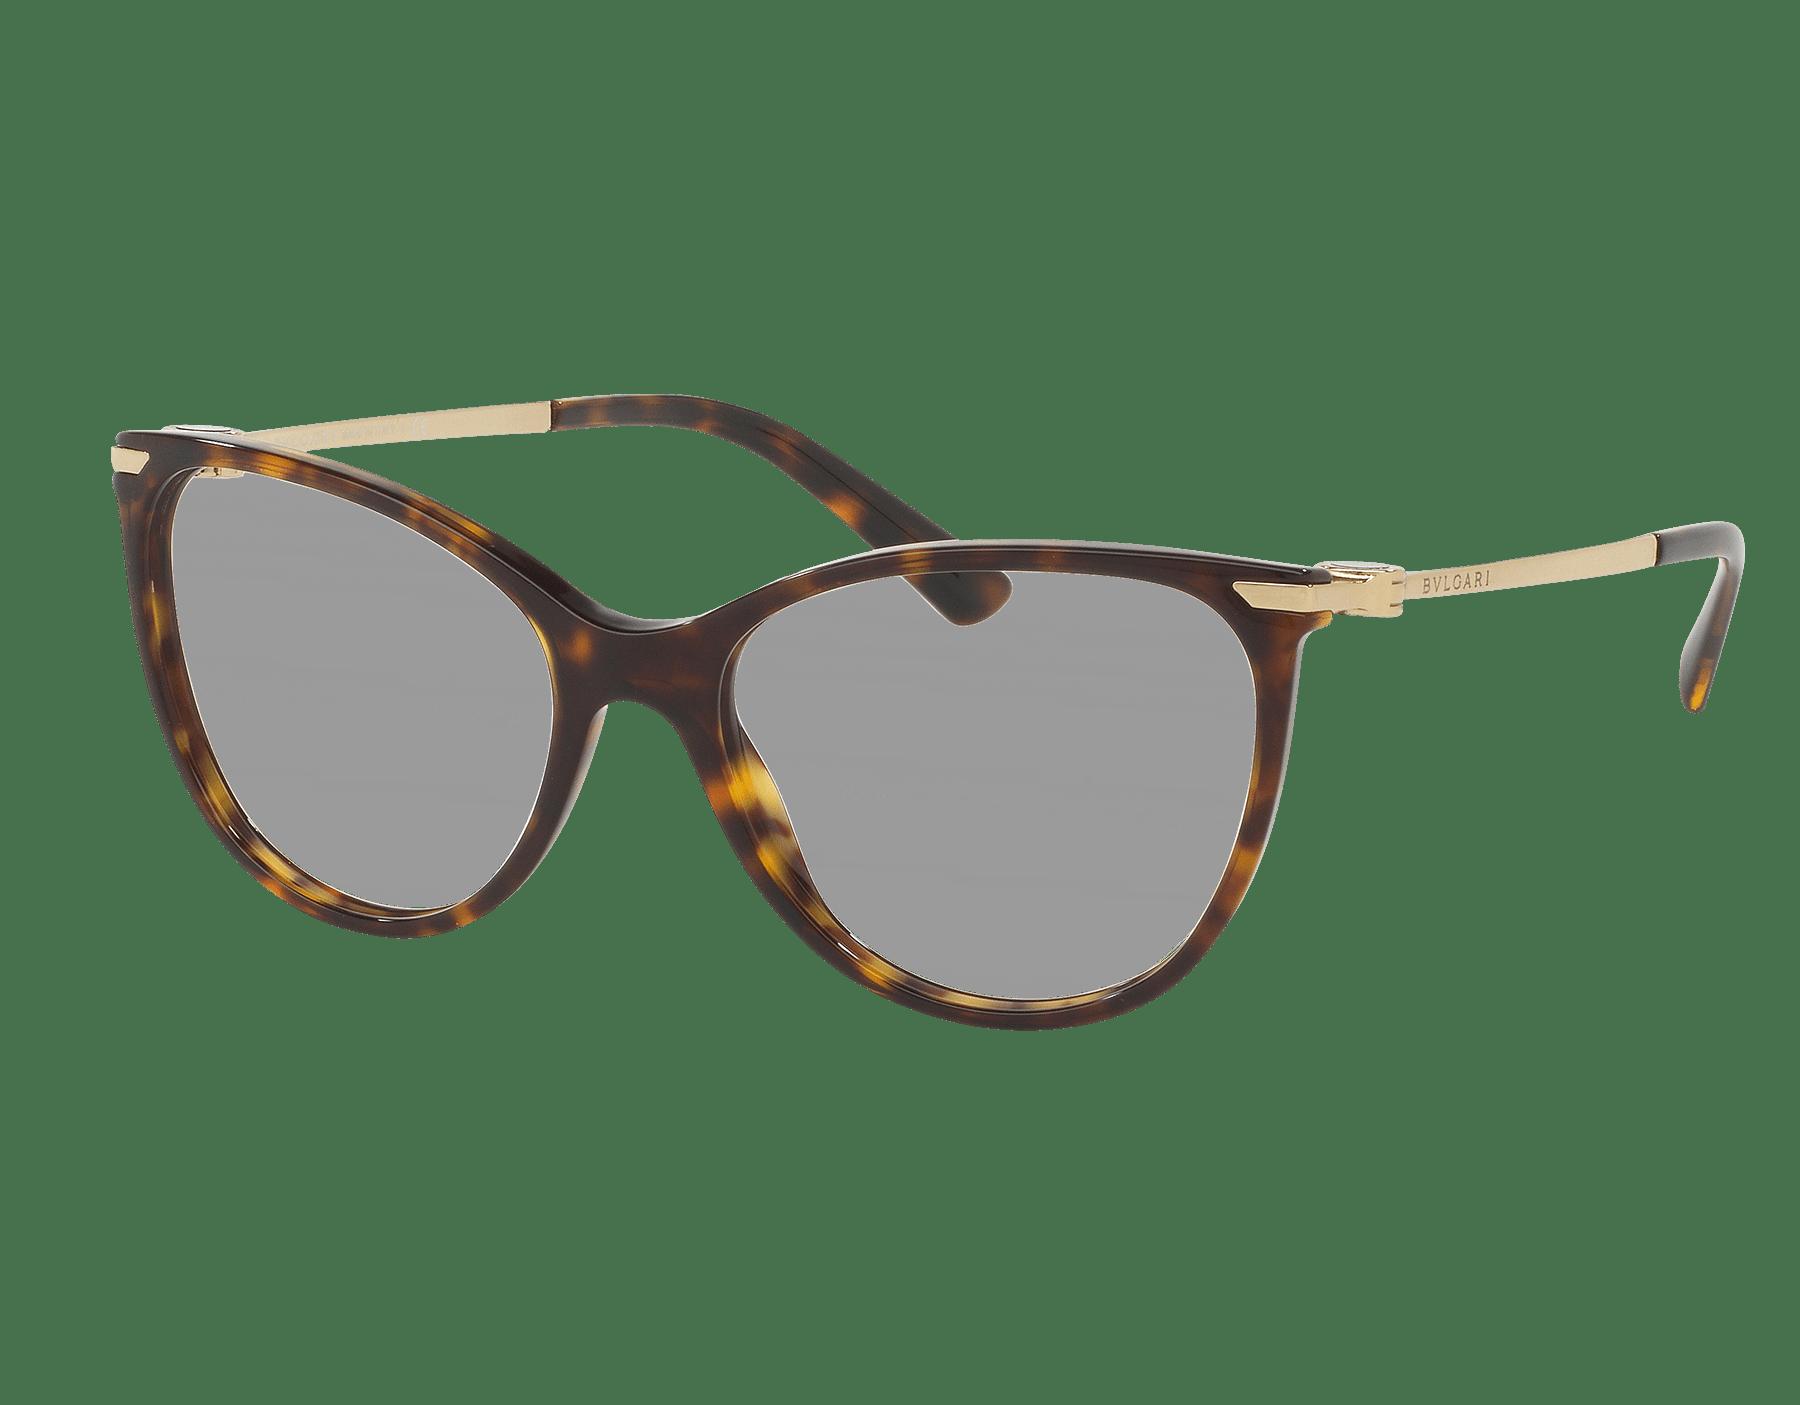 BVLGARI BVLGARI occhiali tondi in acetato 903117 image 1